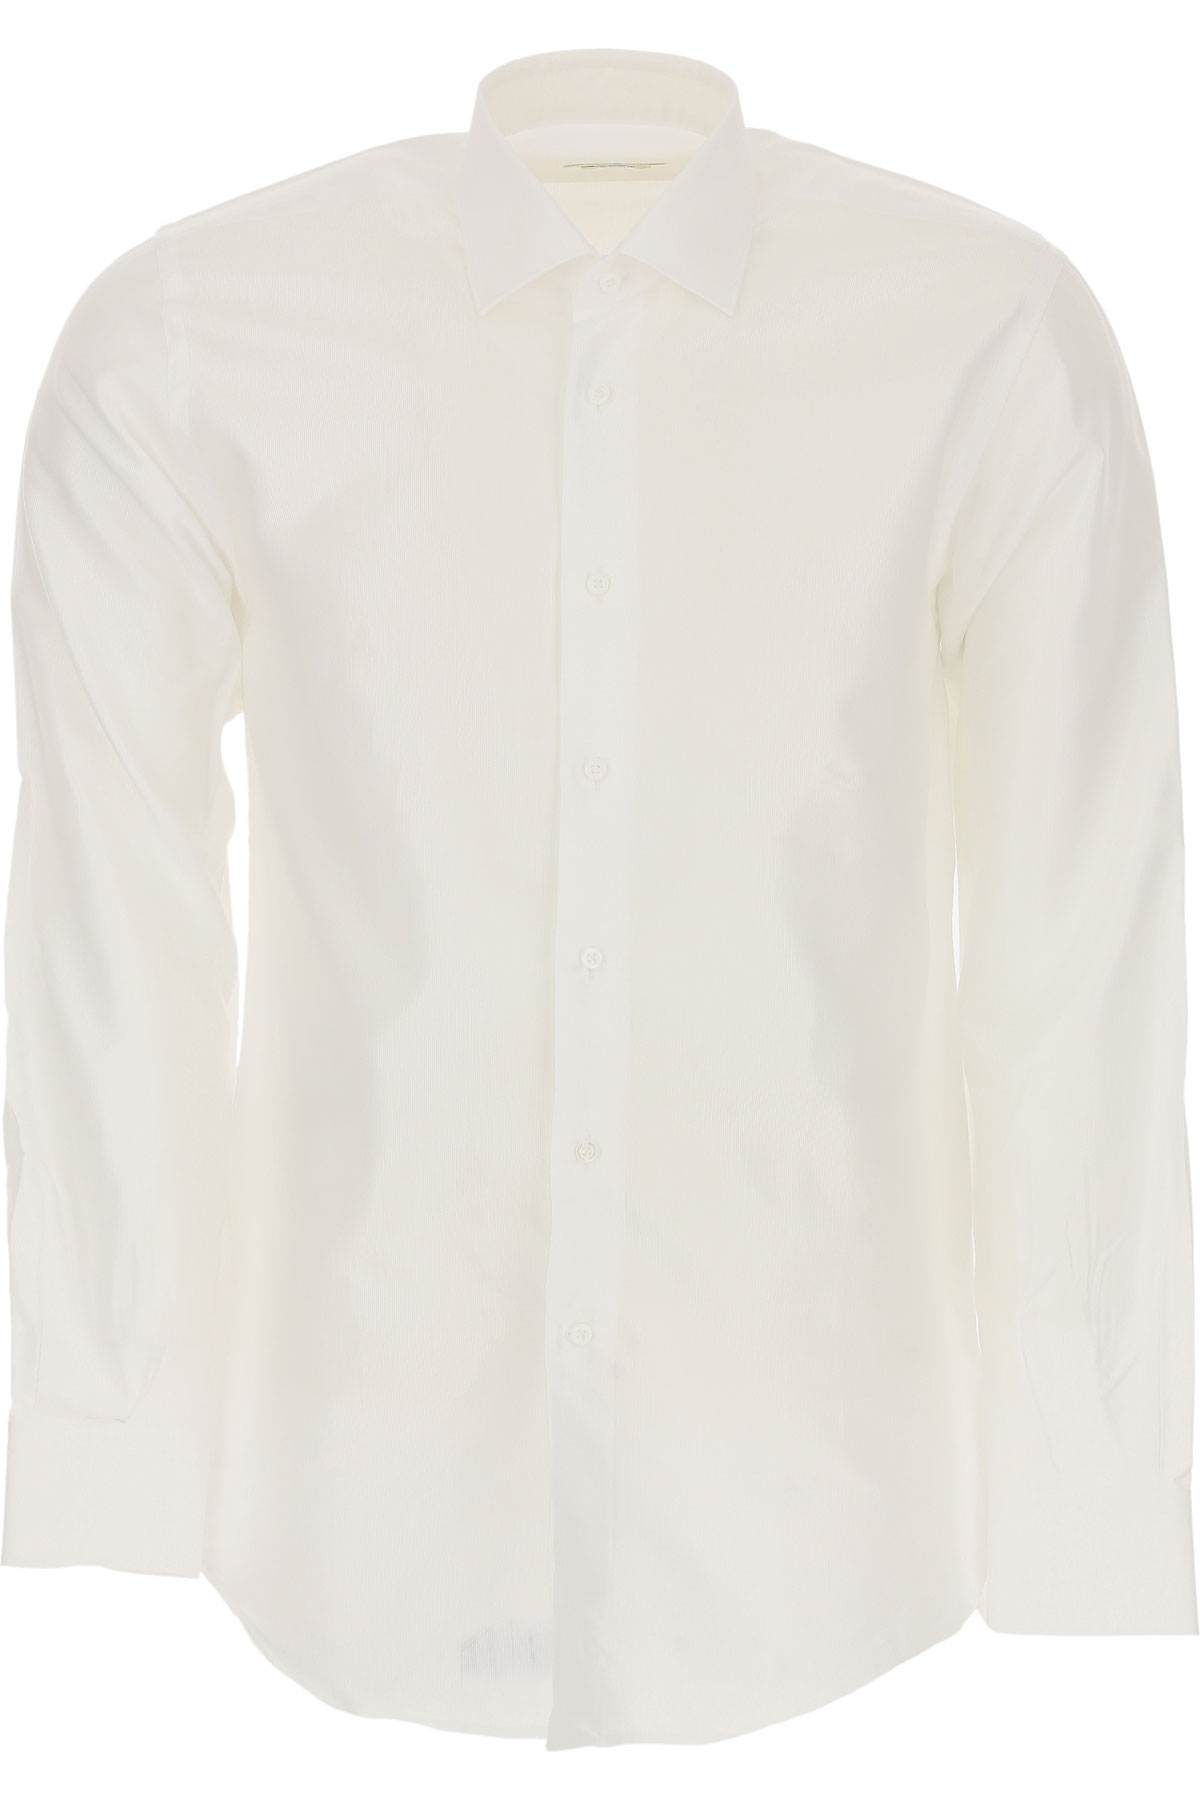 Del Siena Shirt for Men On Sale, White, Cotton, 2019, 15.75 16 17